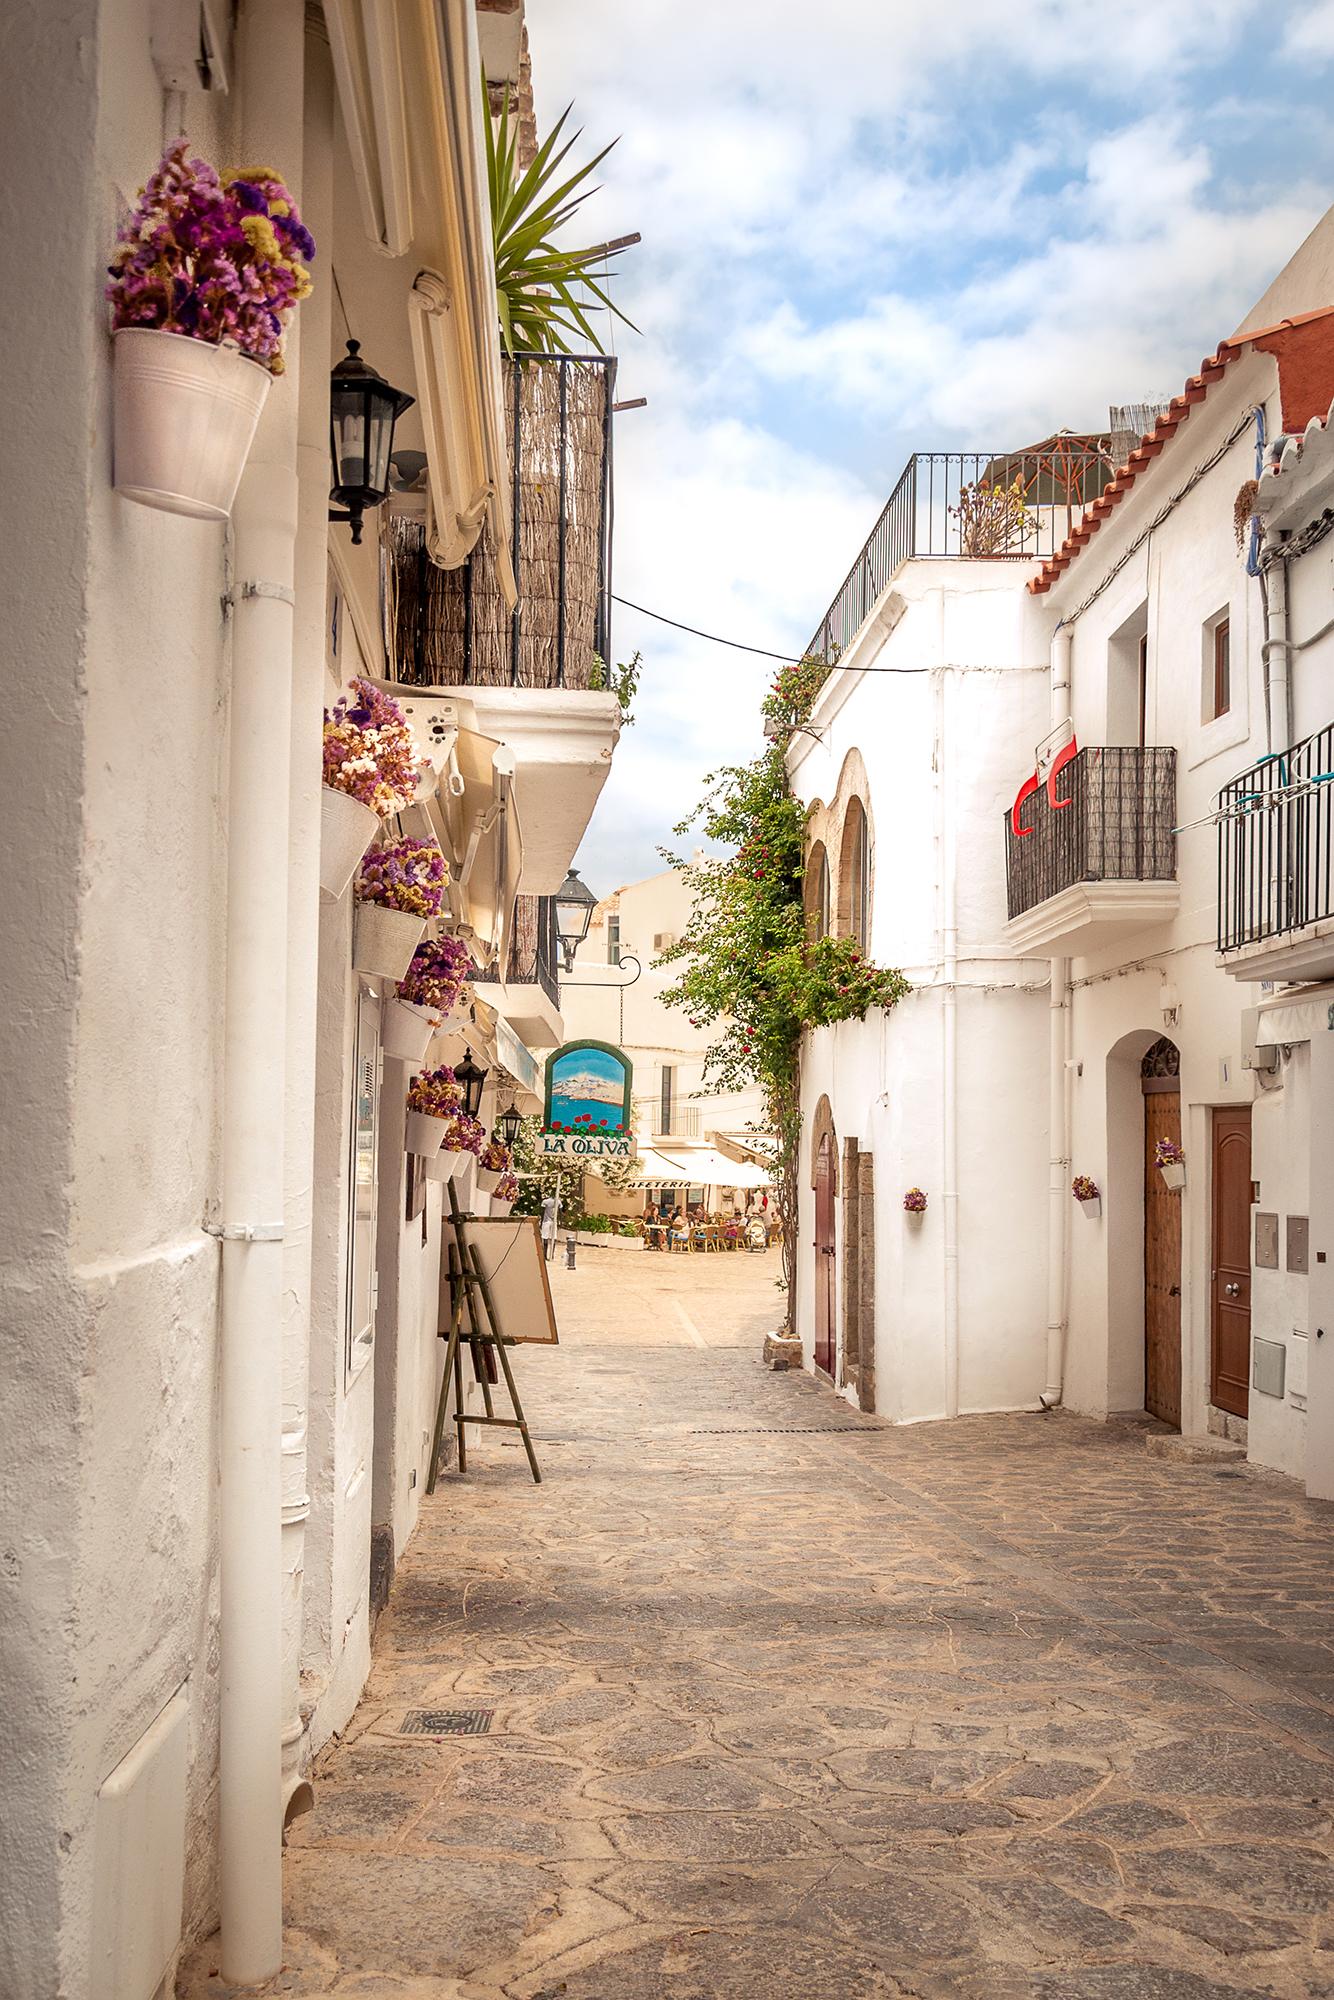 130626 - Ibiza - Daytime - Ibiza Town 001.jpg